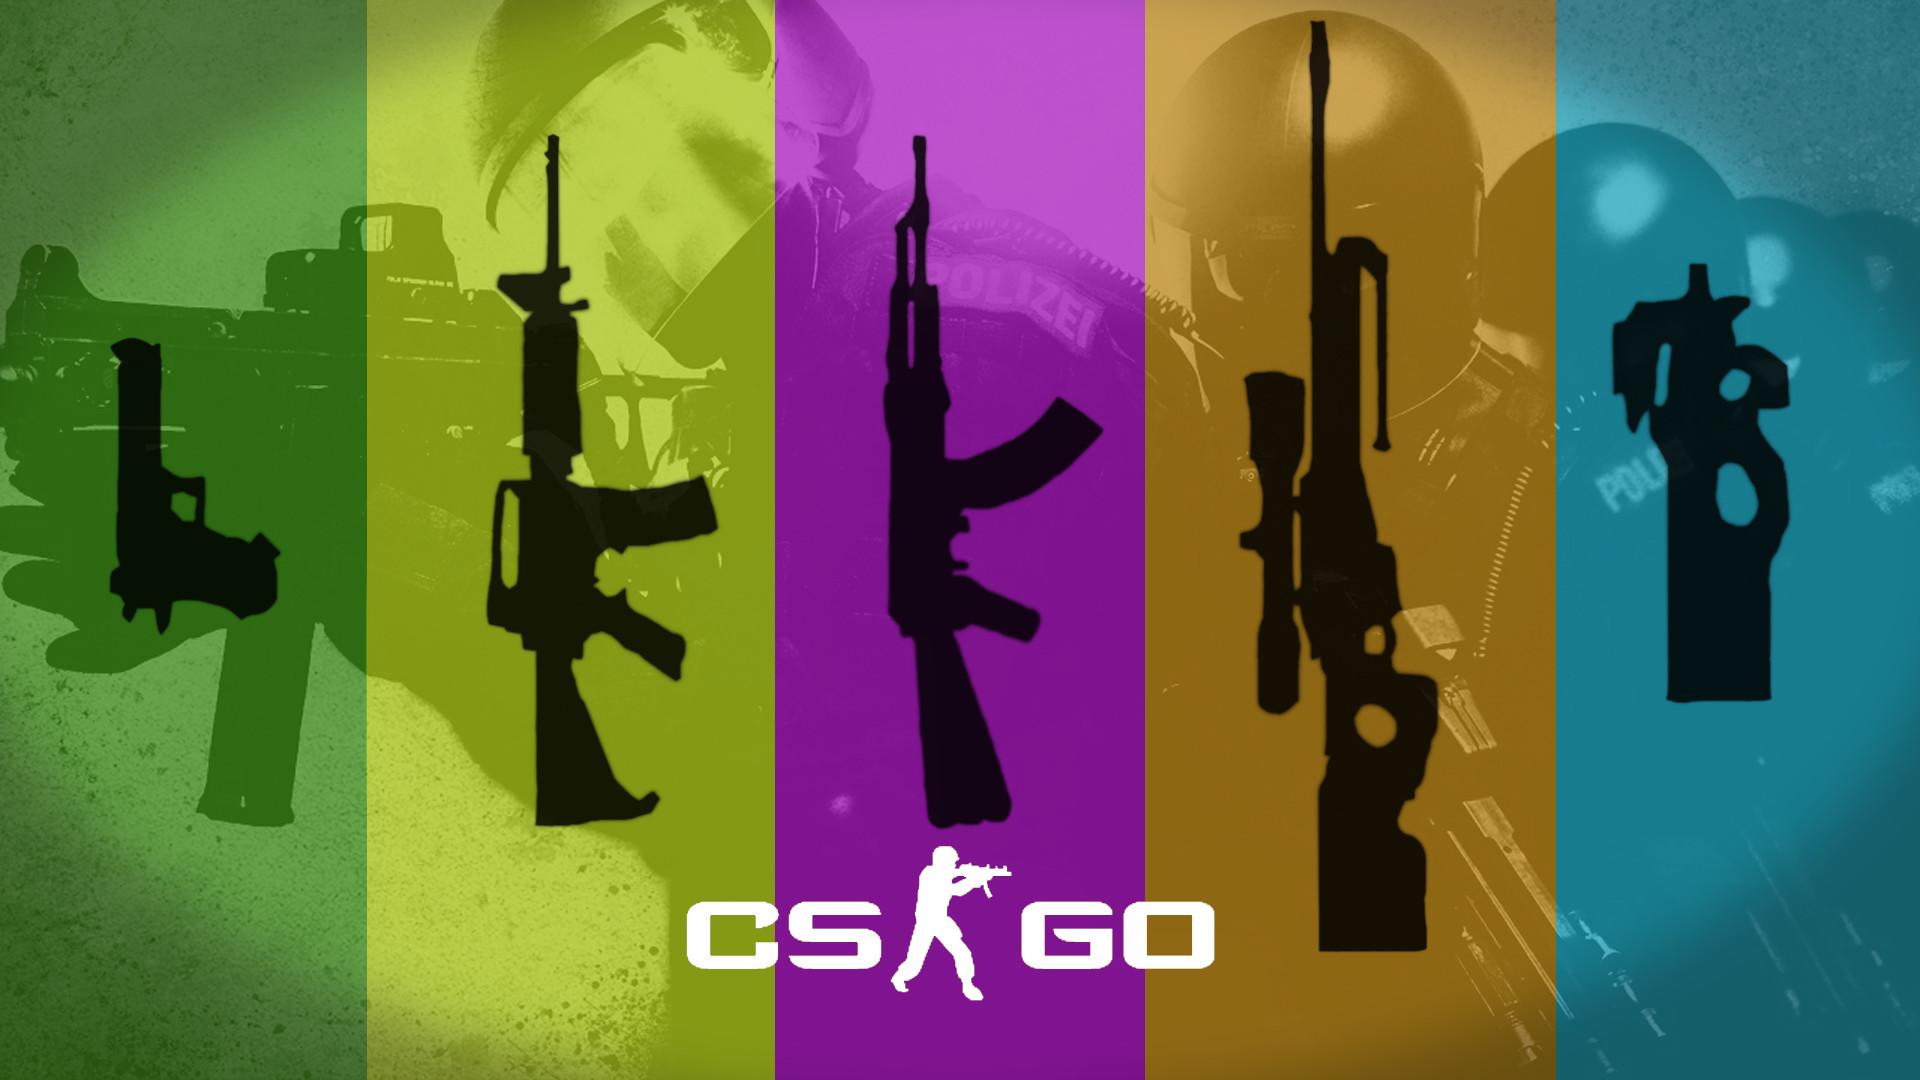 CSGO background by sybergeko on DeviantArt